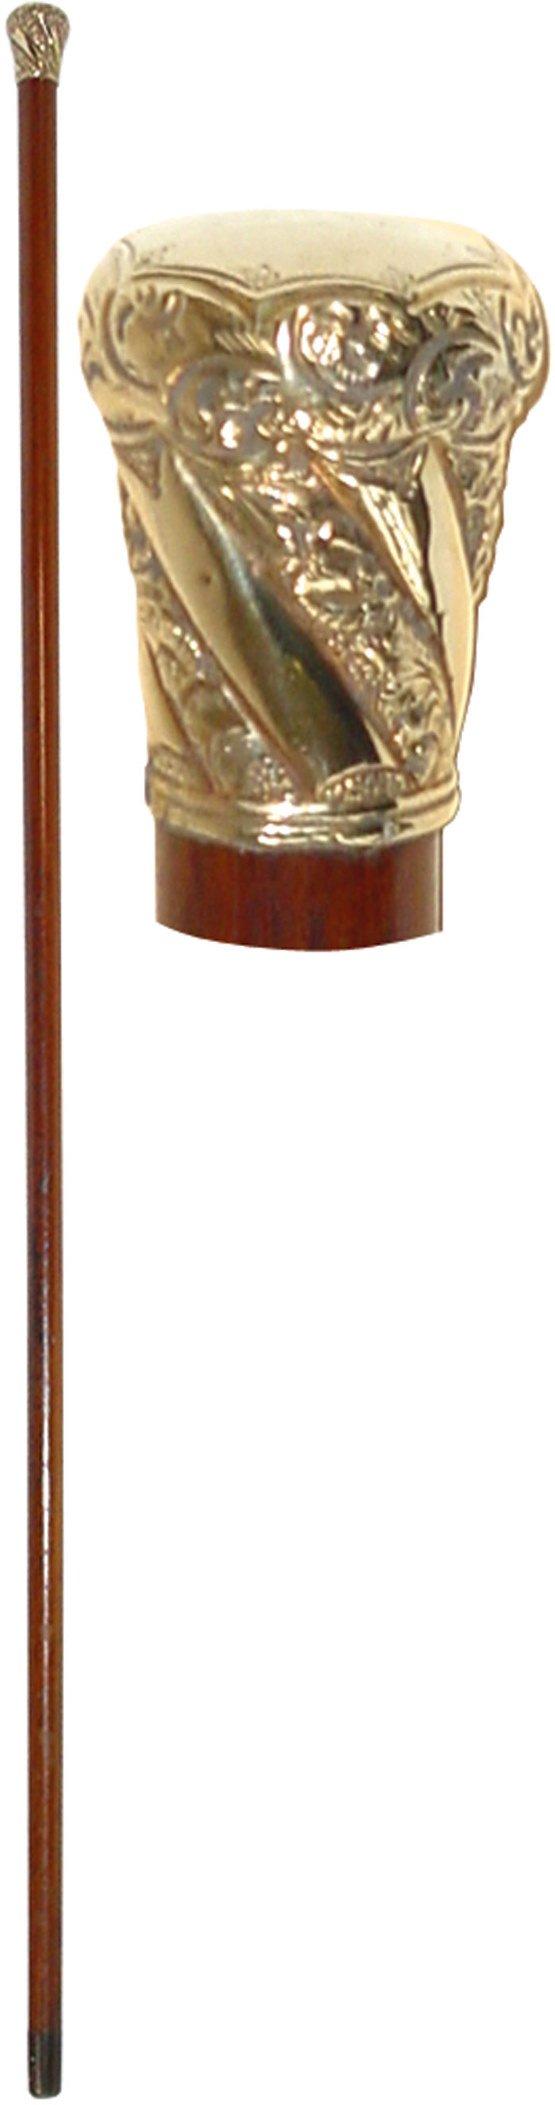 1359: Walking stick, gold handle w/floral filigree, W.